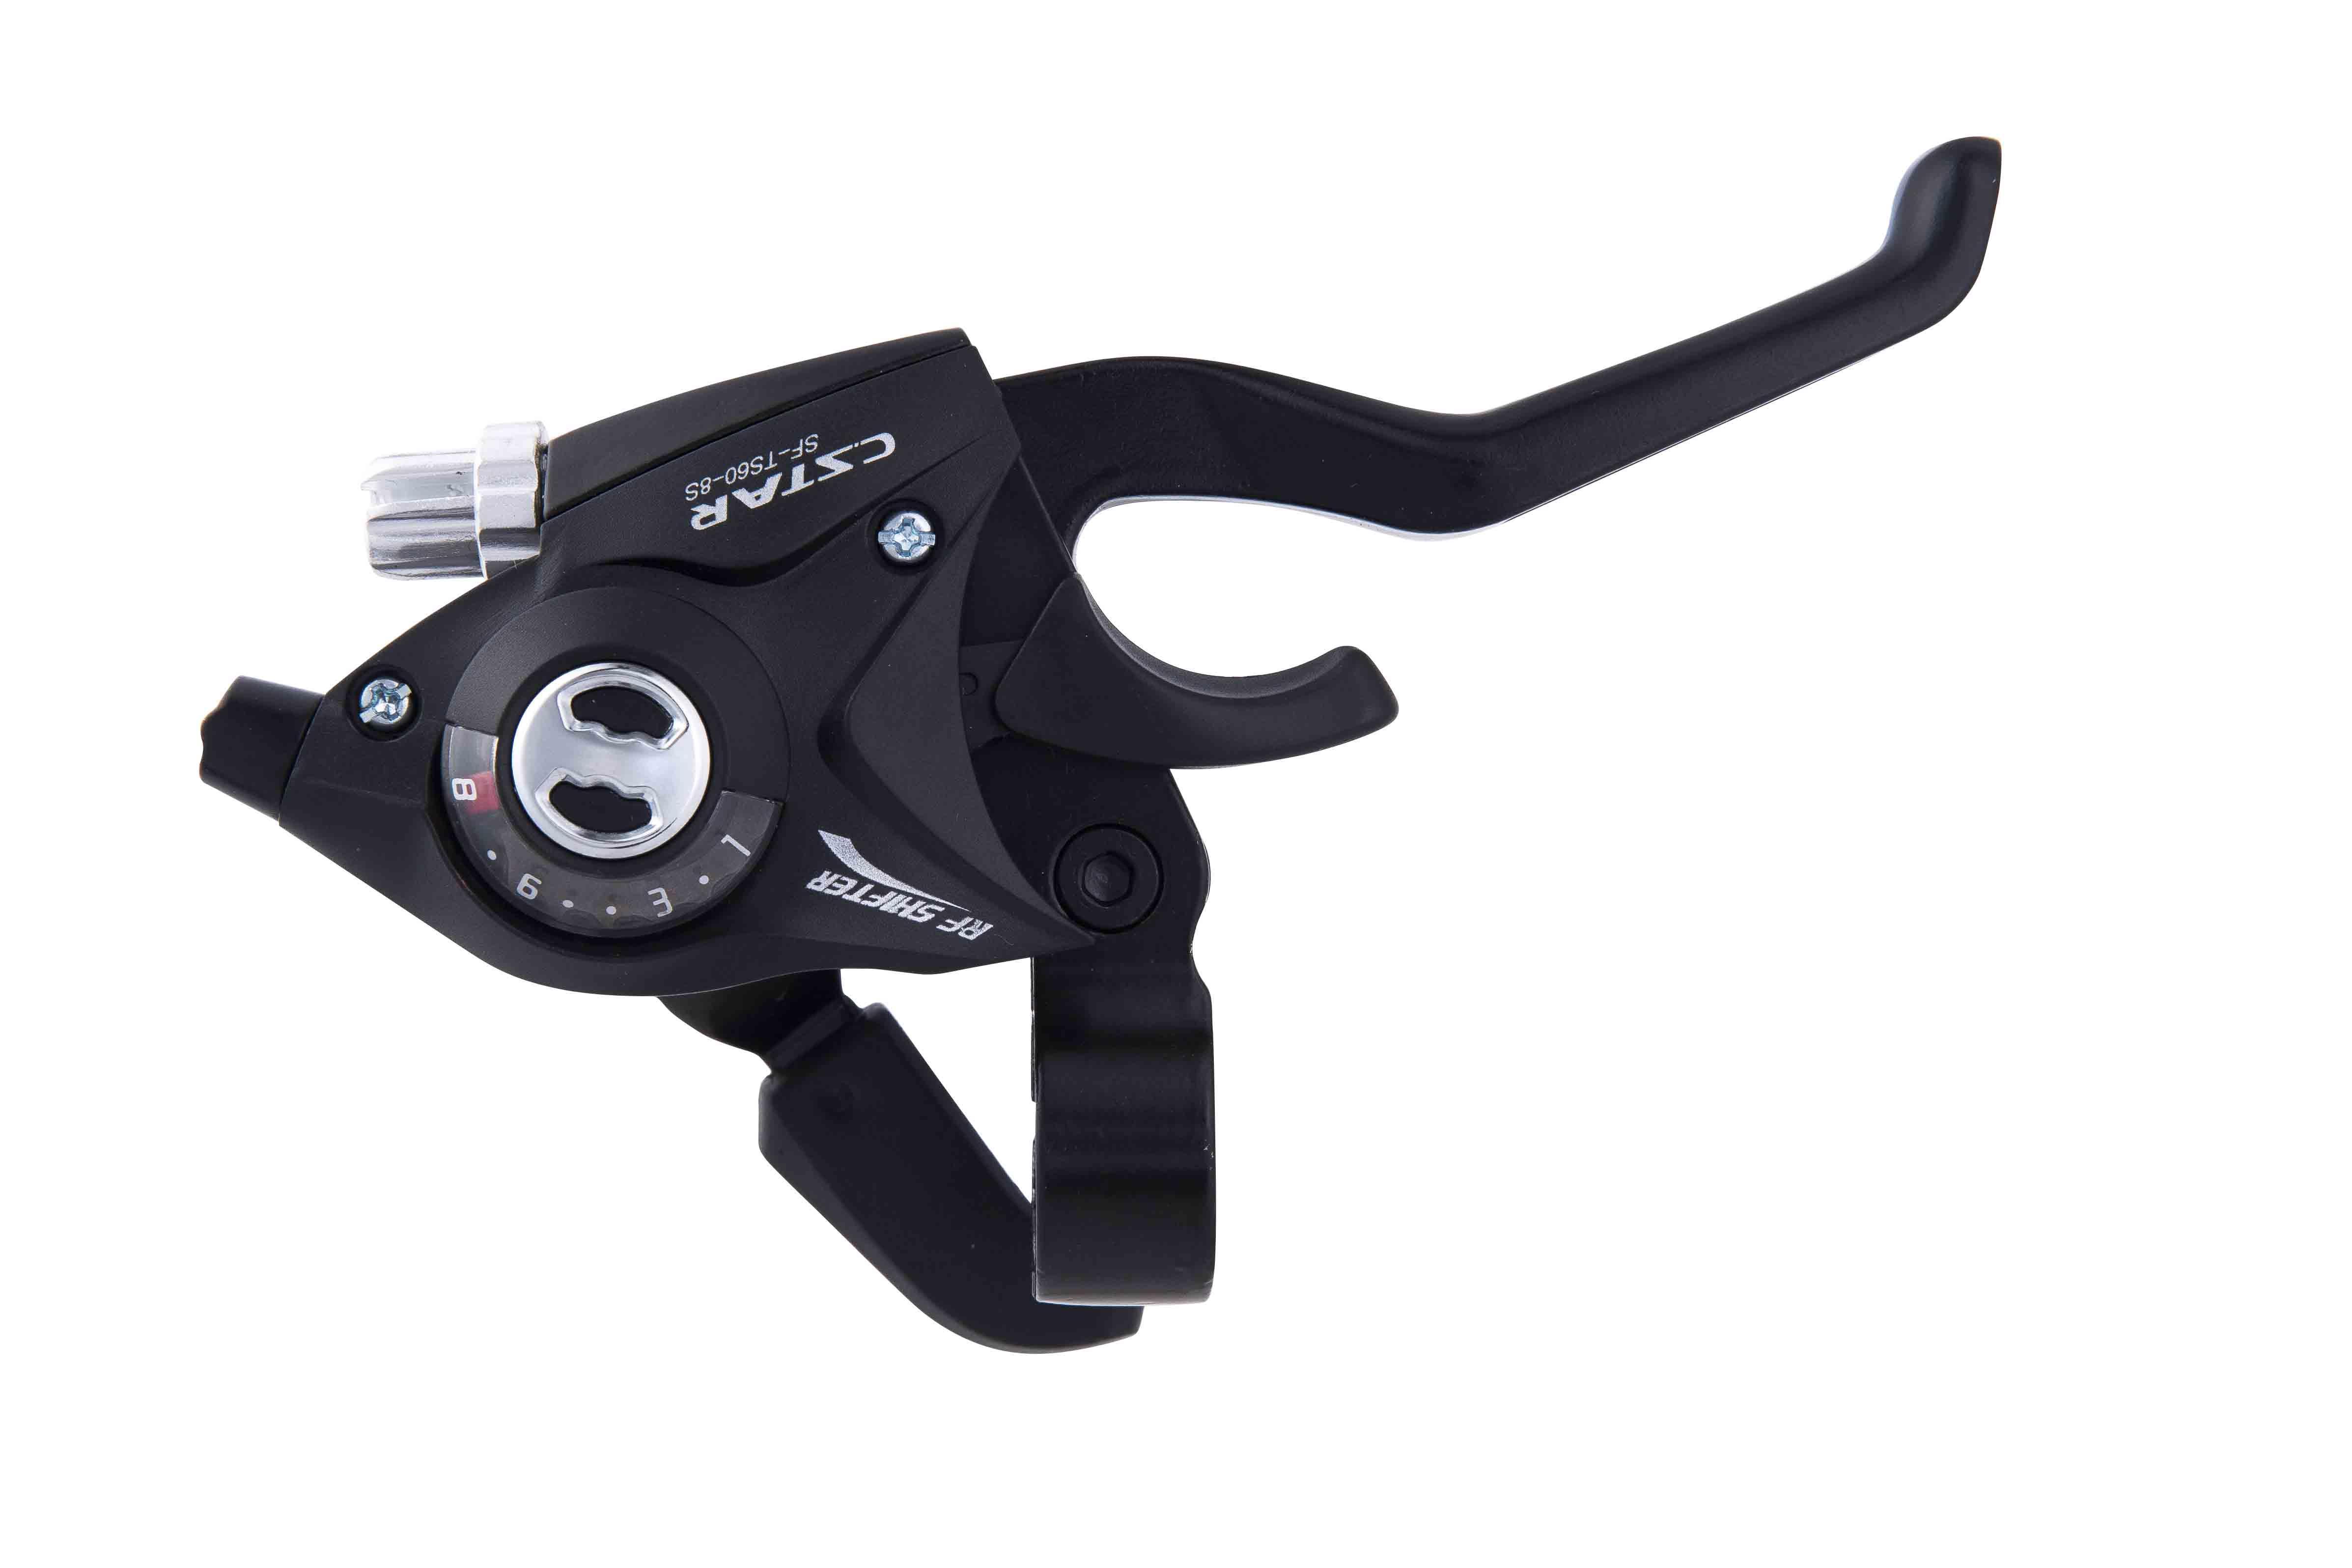 Manete dublu control schimbator-frana Radius SF-TS60, stanga-fata 3vit, dreapta-spate 8 vit, cabluri incluse, aluminiu-nylon, negre [1]